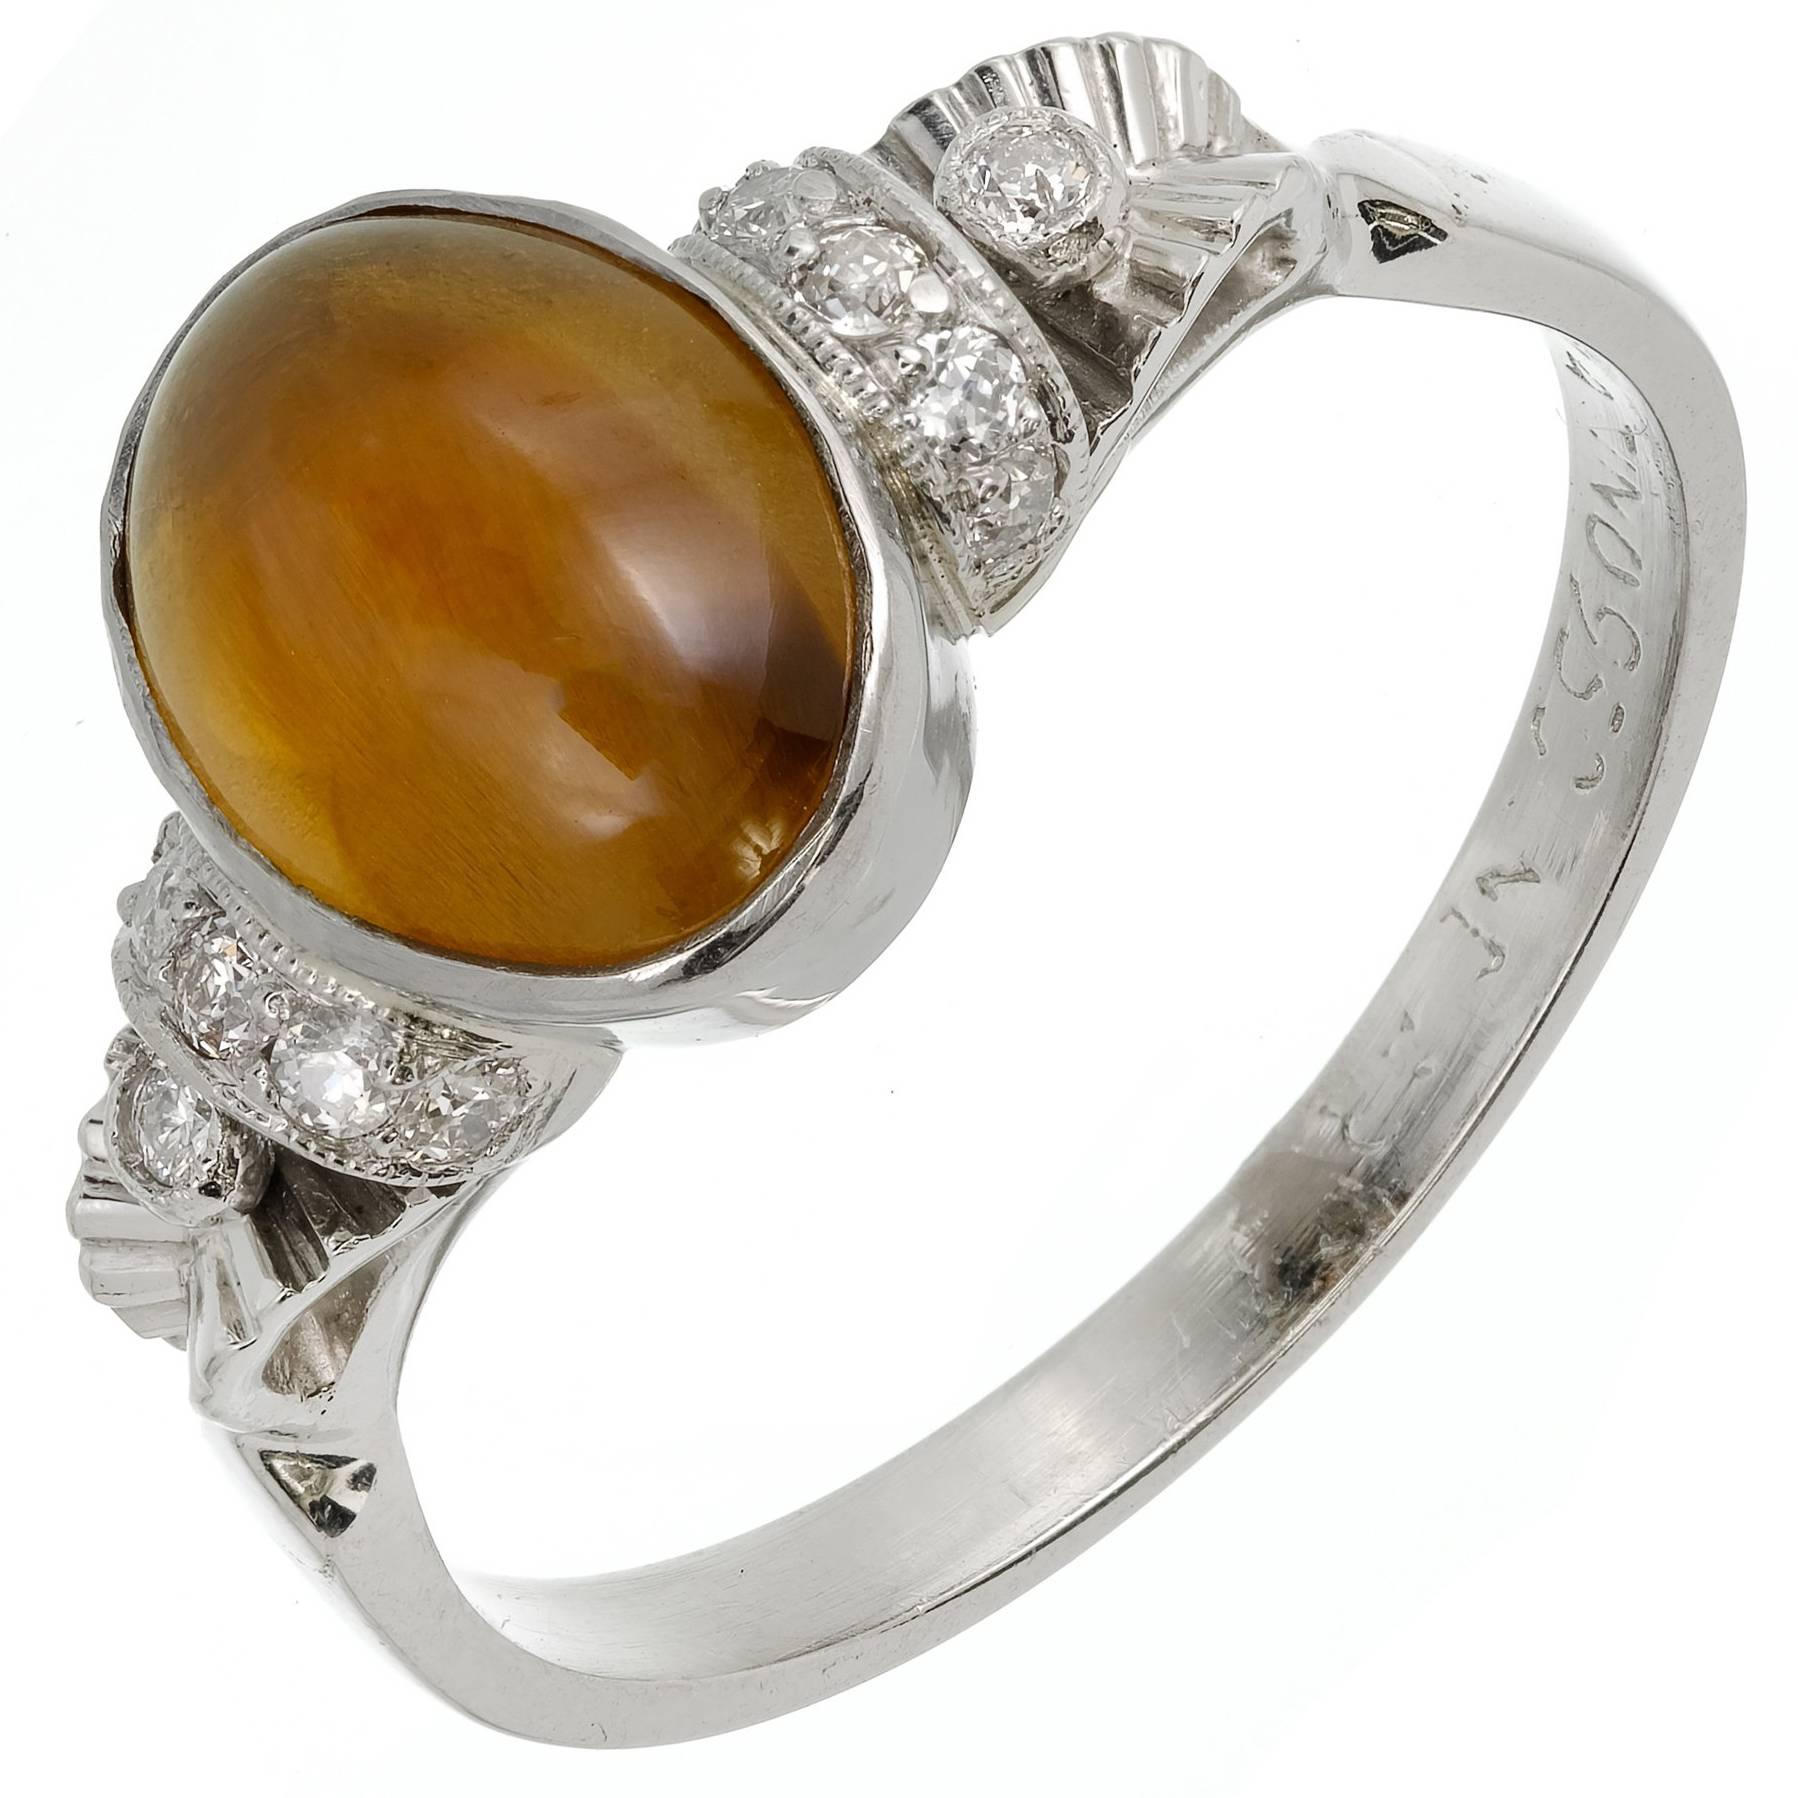 GIA Certified 2.71 Carat Chrysoberyl Cat's Eye Diamond Platinum Engagement Ring